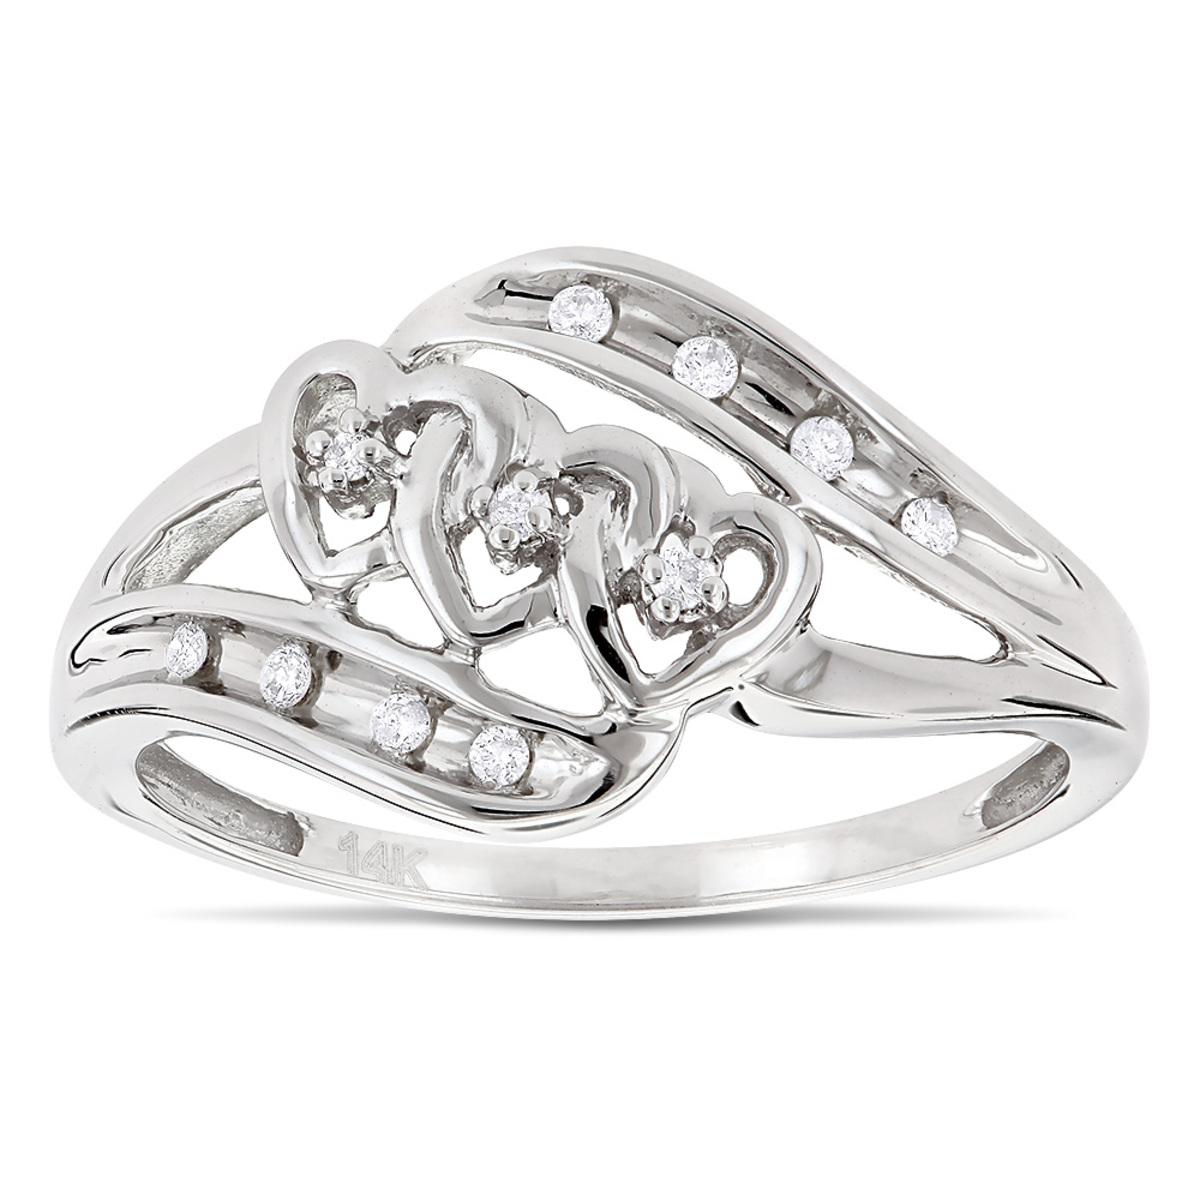 Moms 10K Gold Heart Shaped Diamond Ring 0.10ct